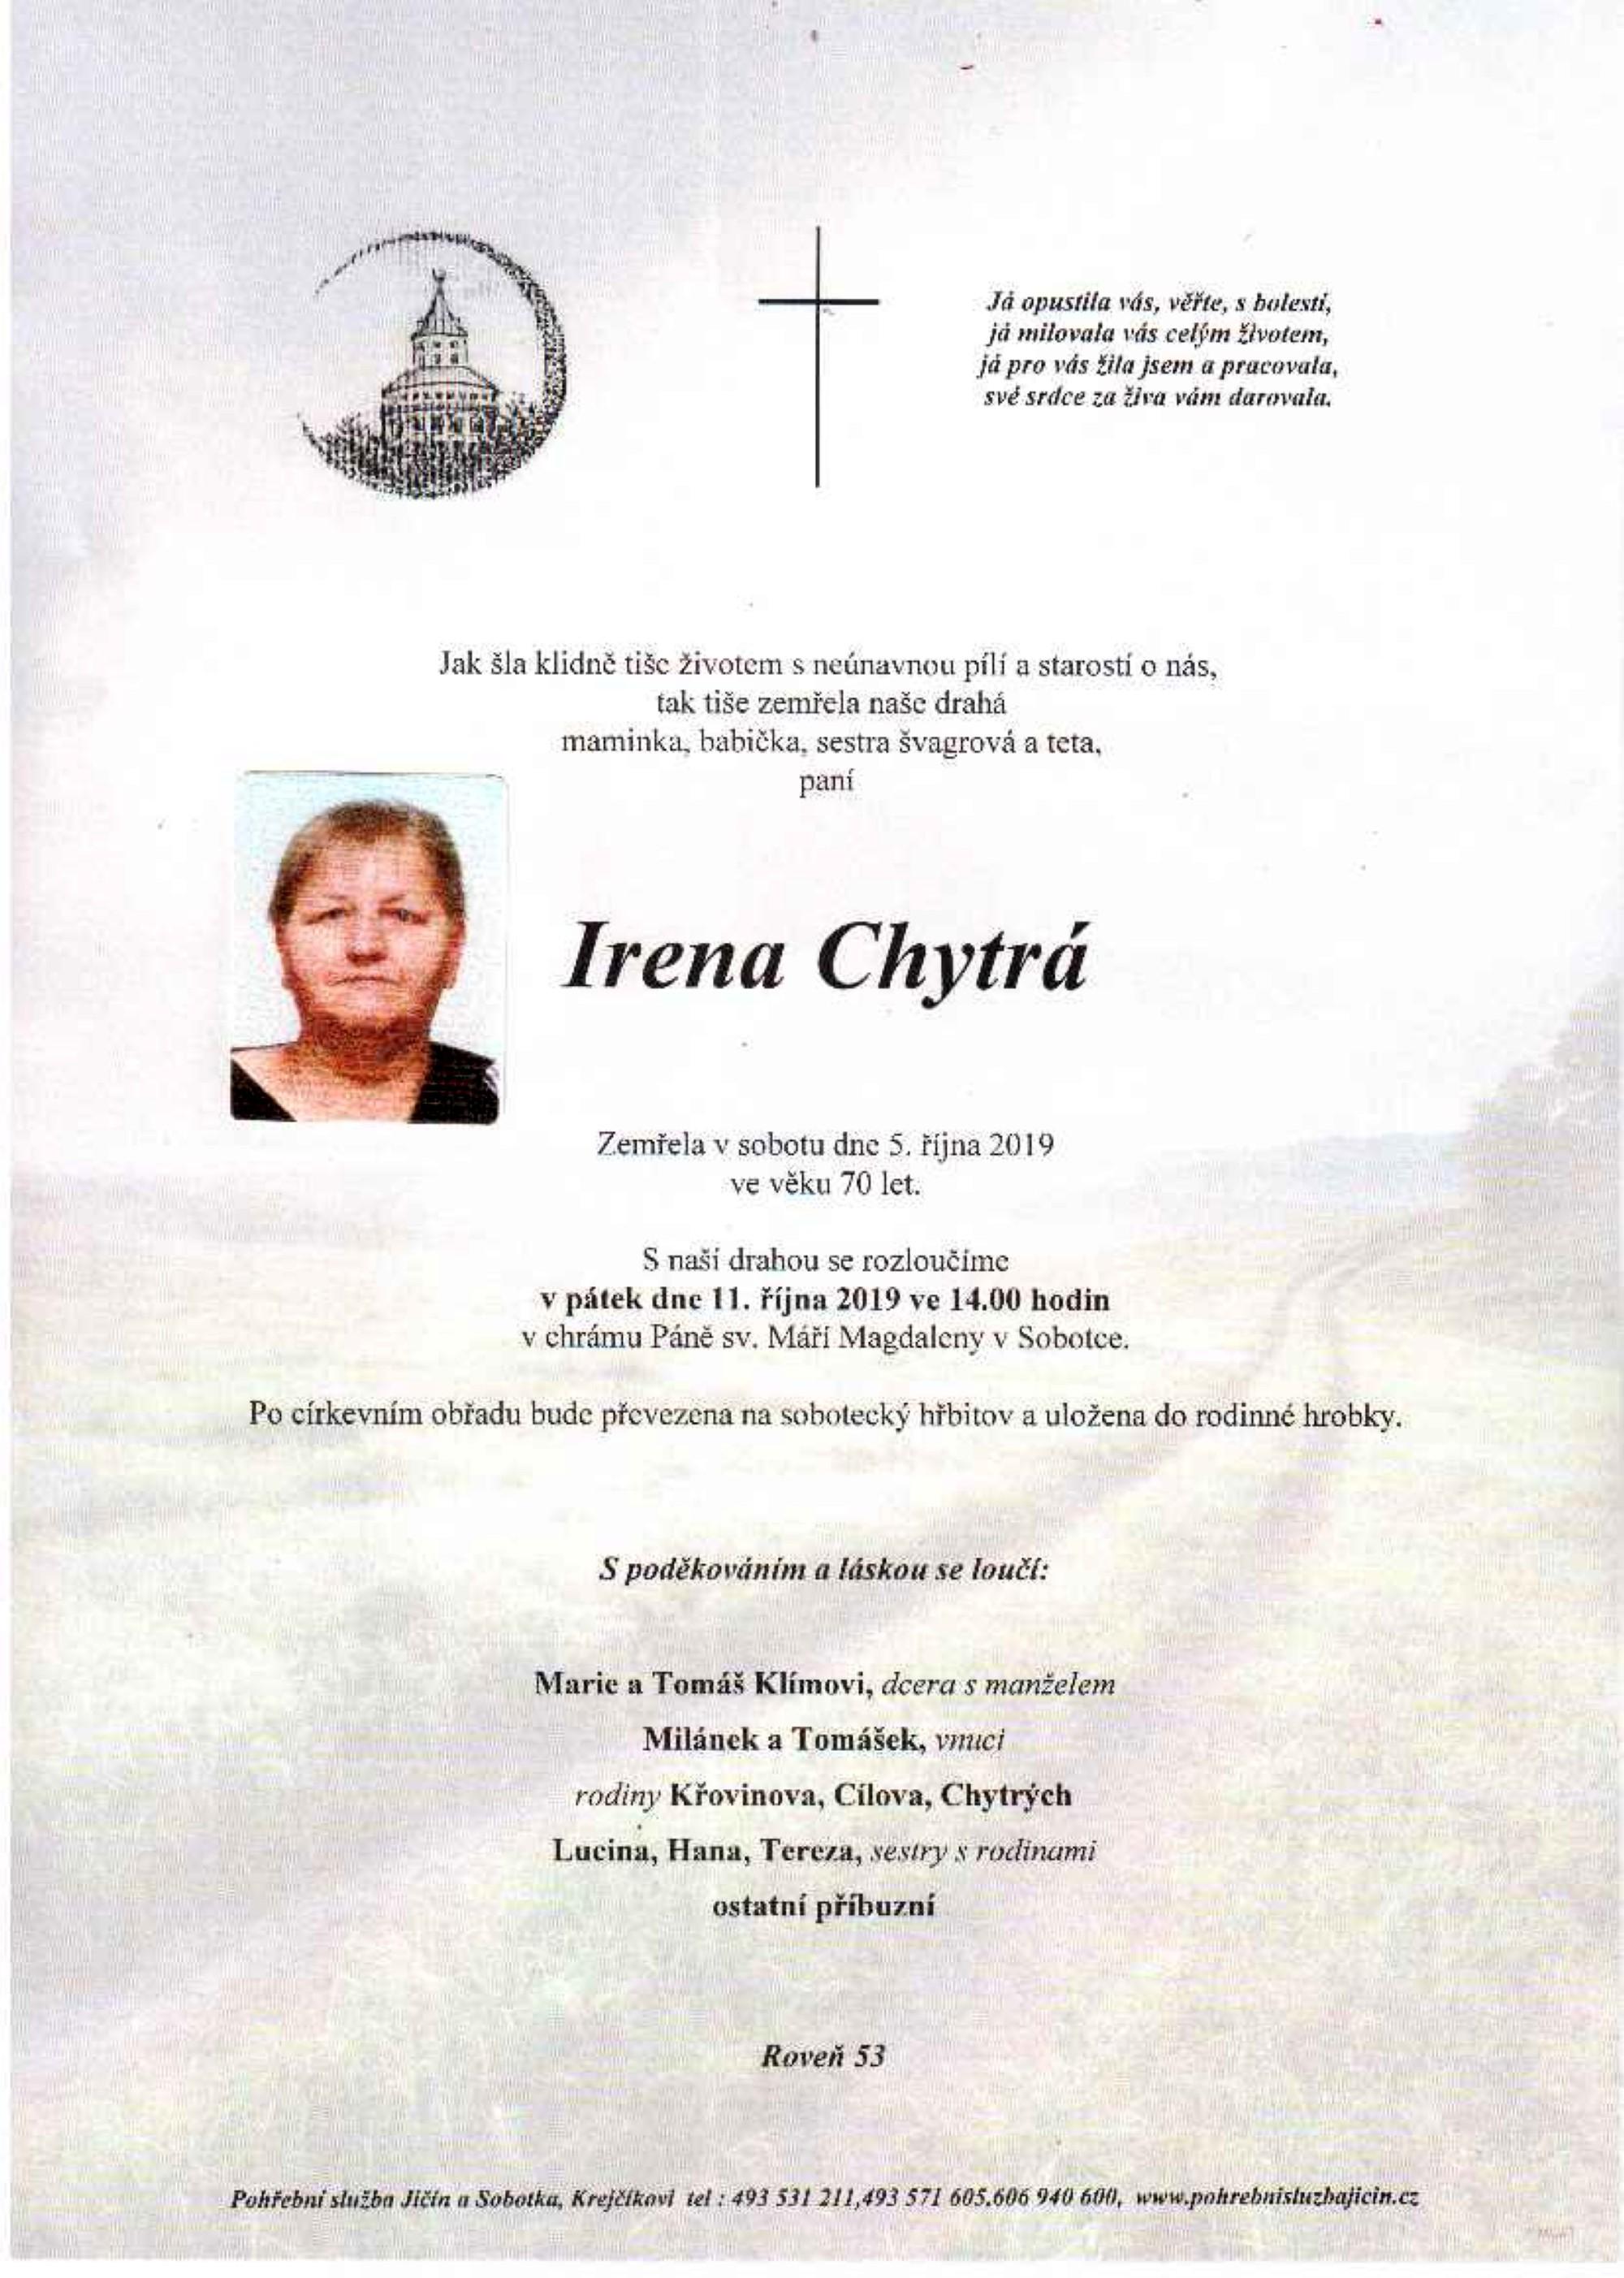 Irena Chytrá